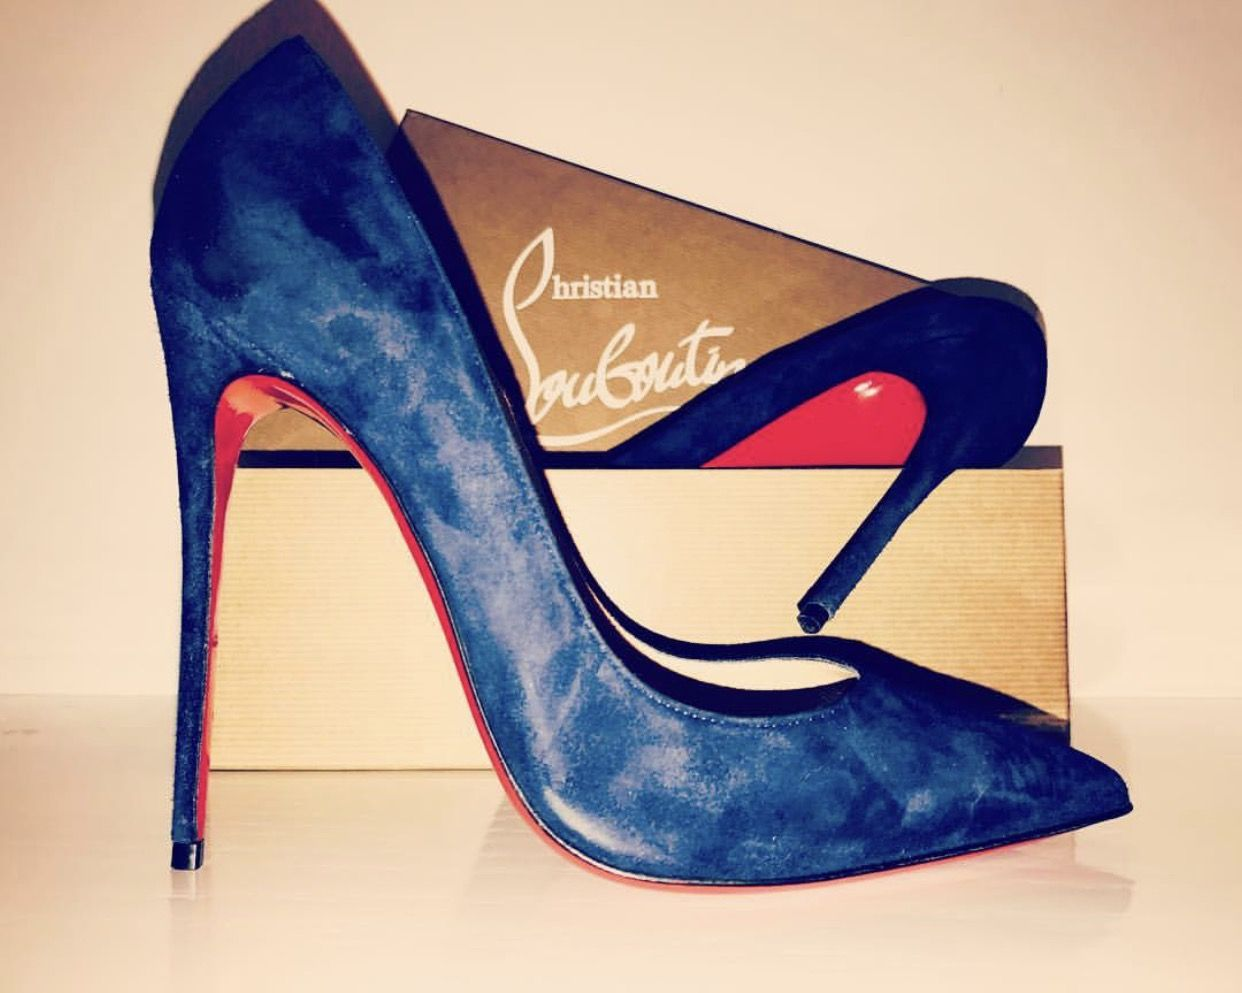 Pump 12 Cm Louboutin Blue Dark Shoes VeauChaussures uOiwPkXZT